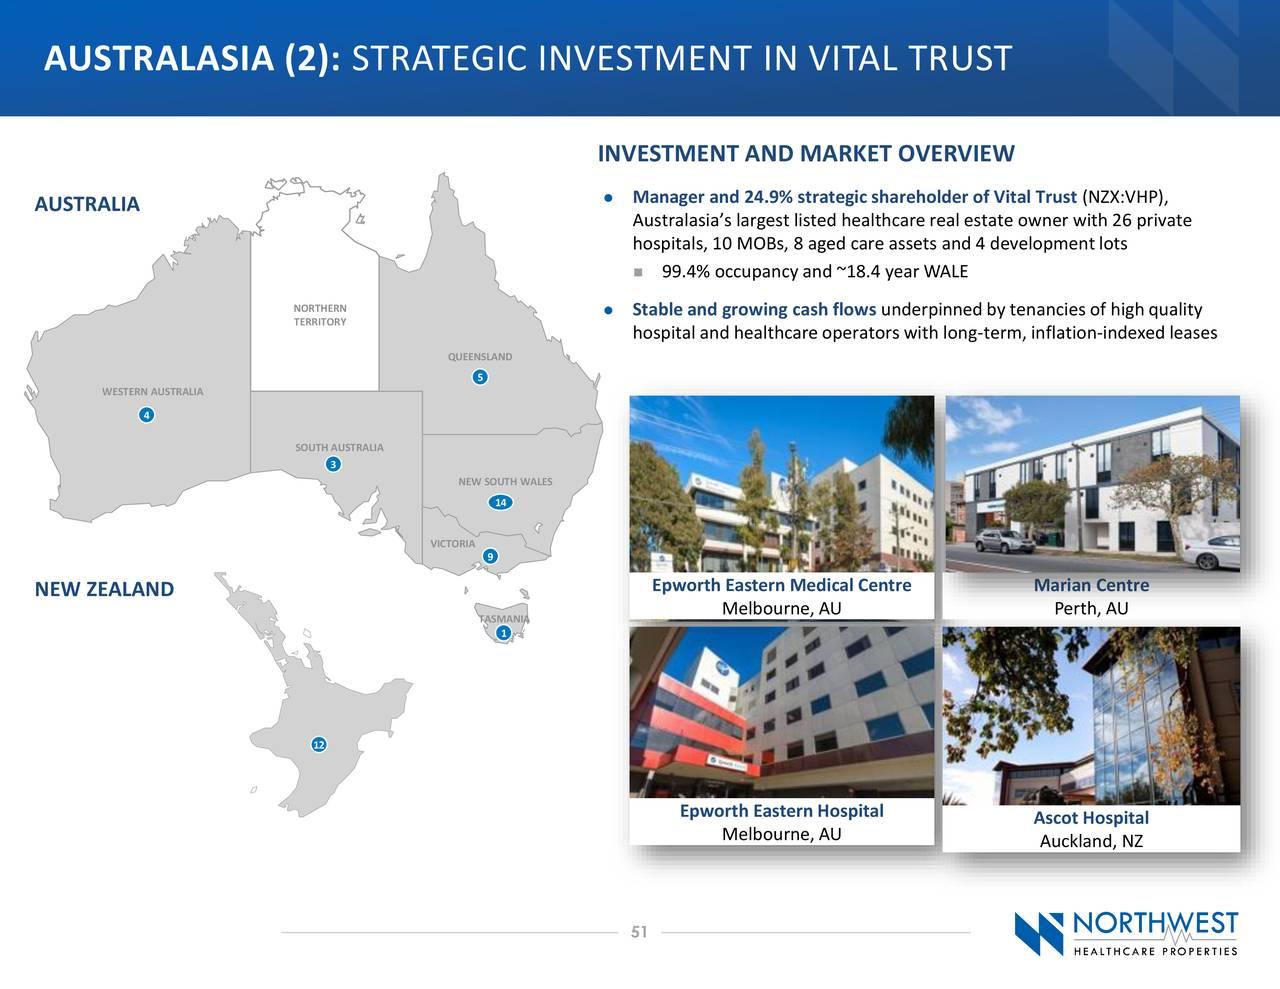 AUSTRALASIA (2): INVERSIÓN ESTRATÉGICA EN CONFIANZA VITAL